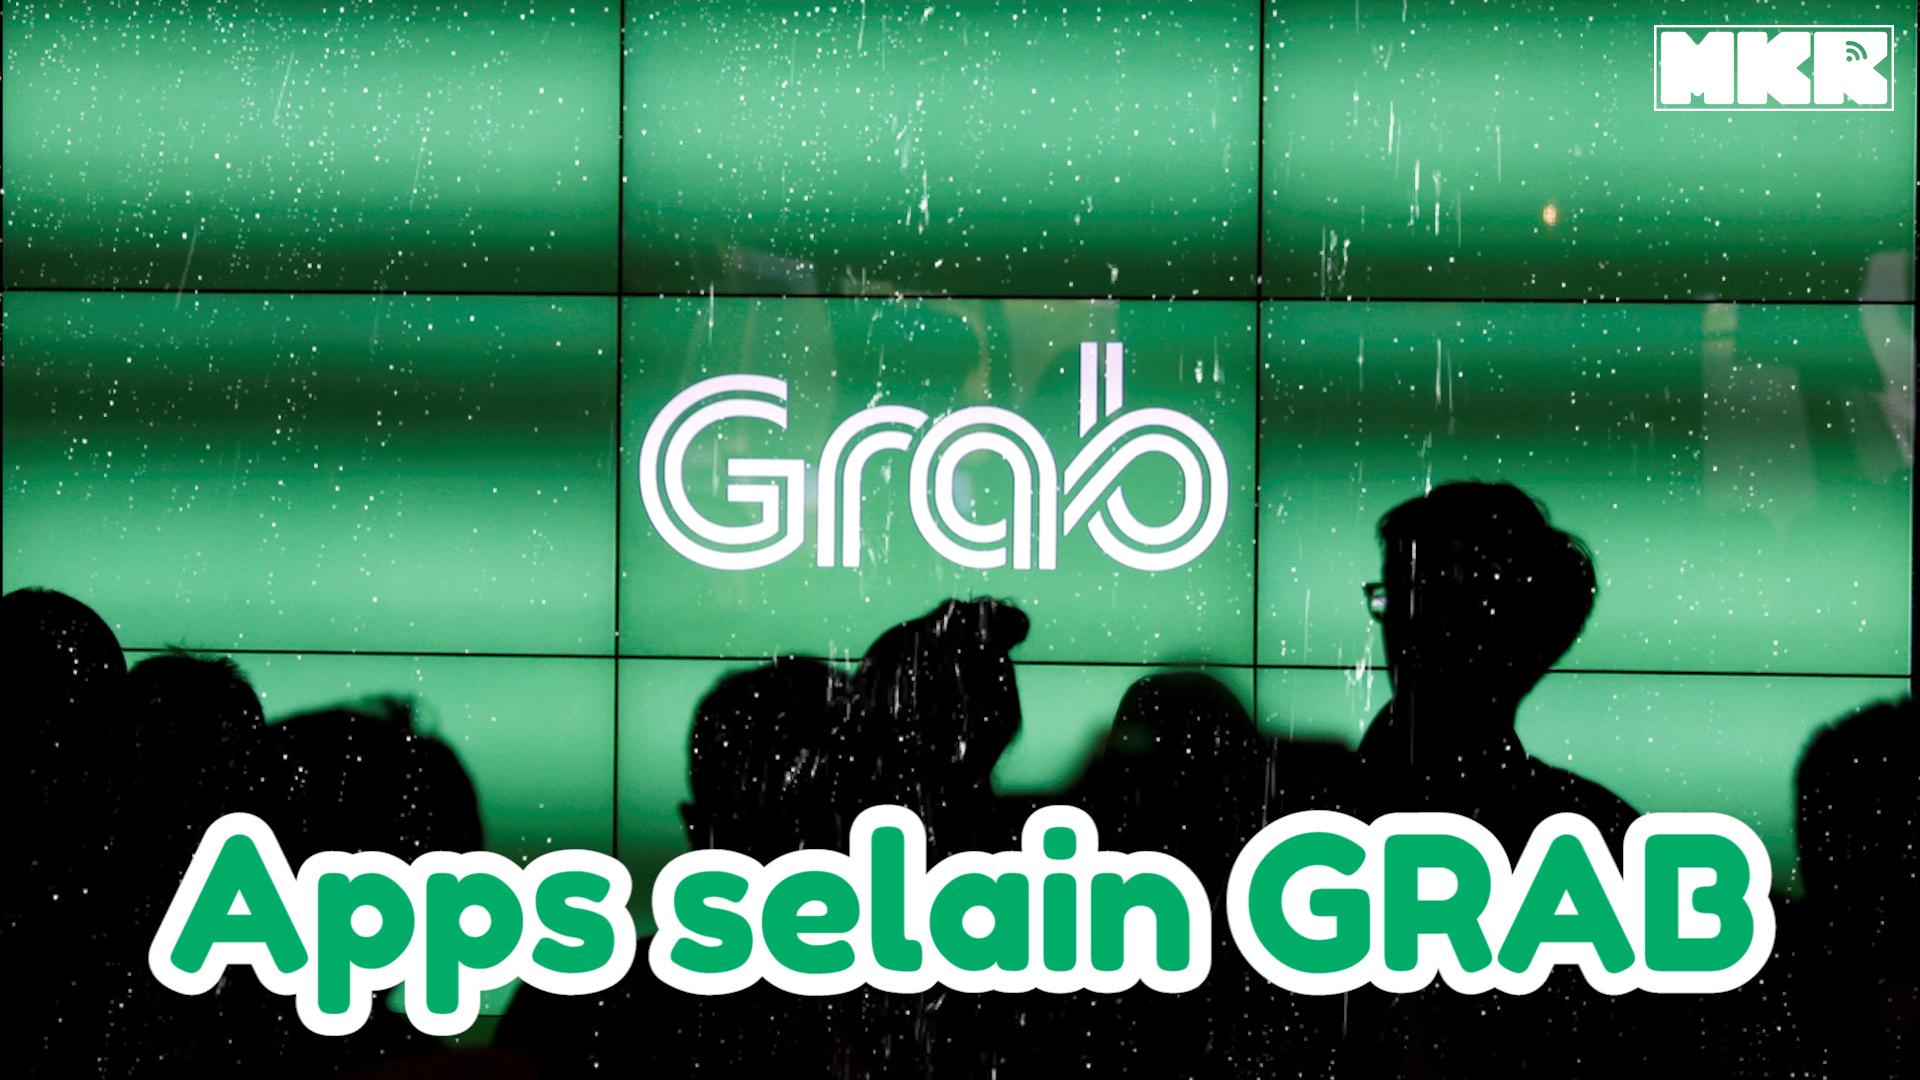 Apps selain GRAB